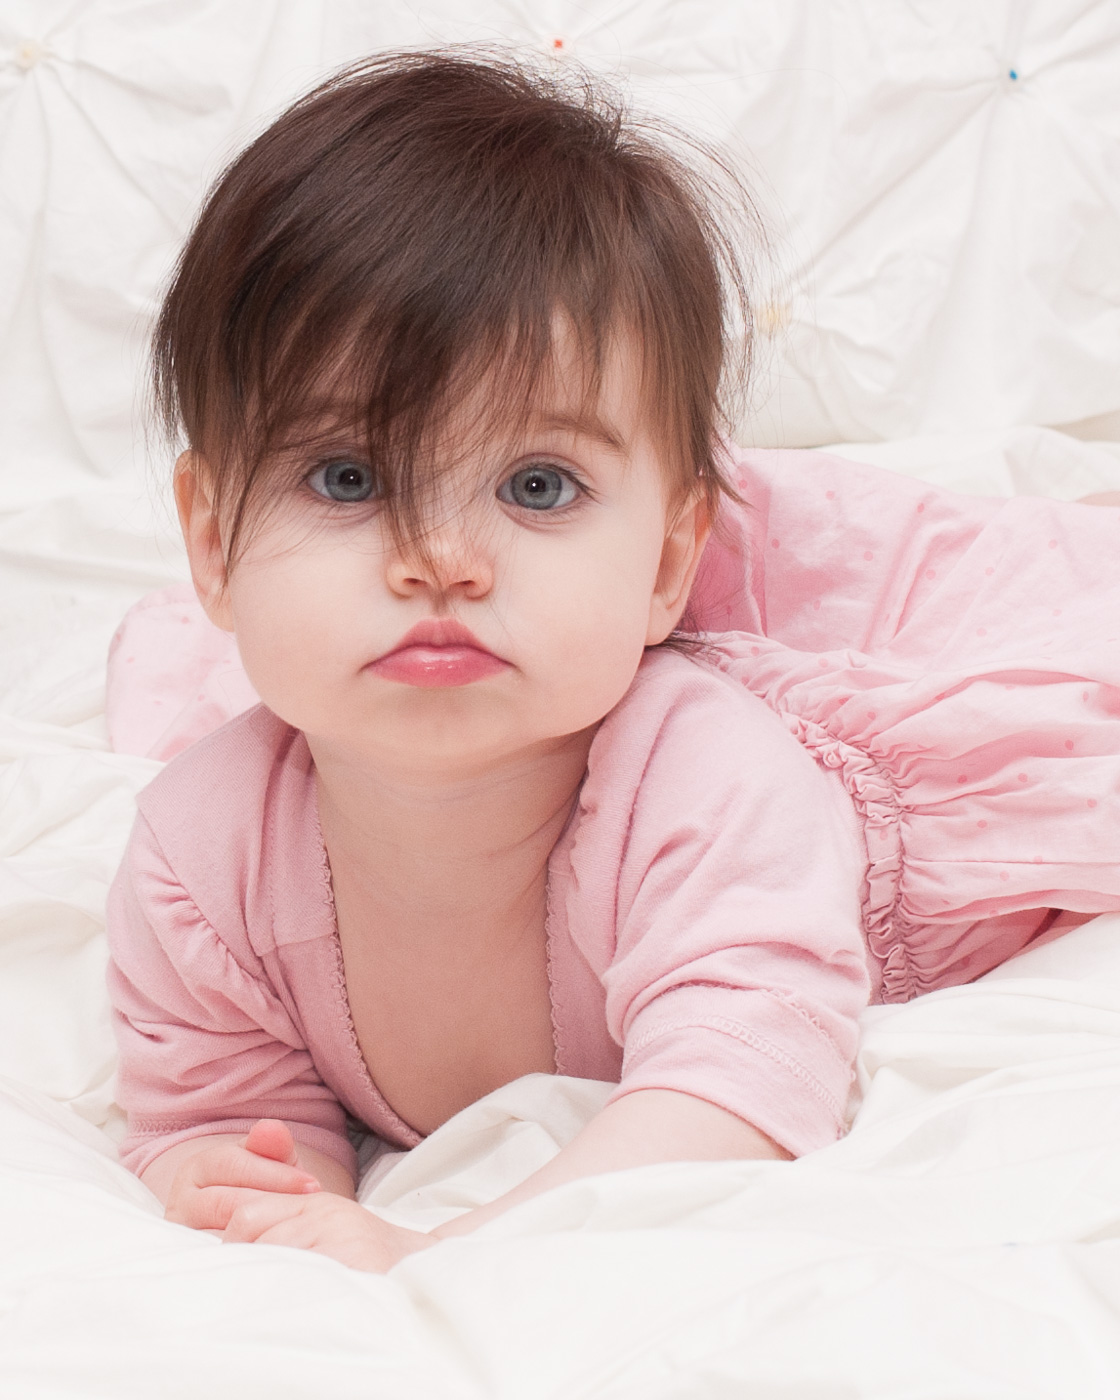 Baby portrait photography - Brooklyn